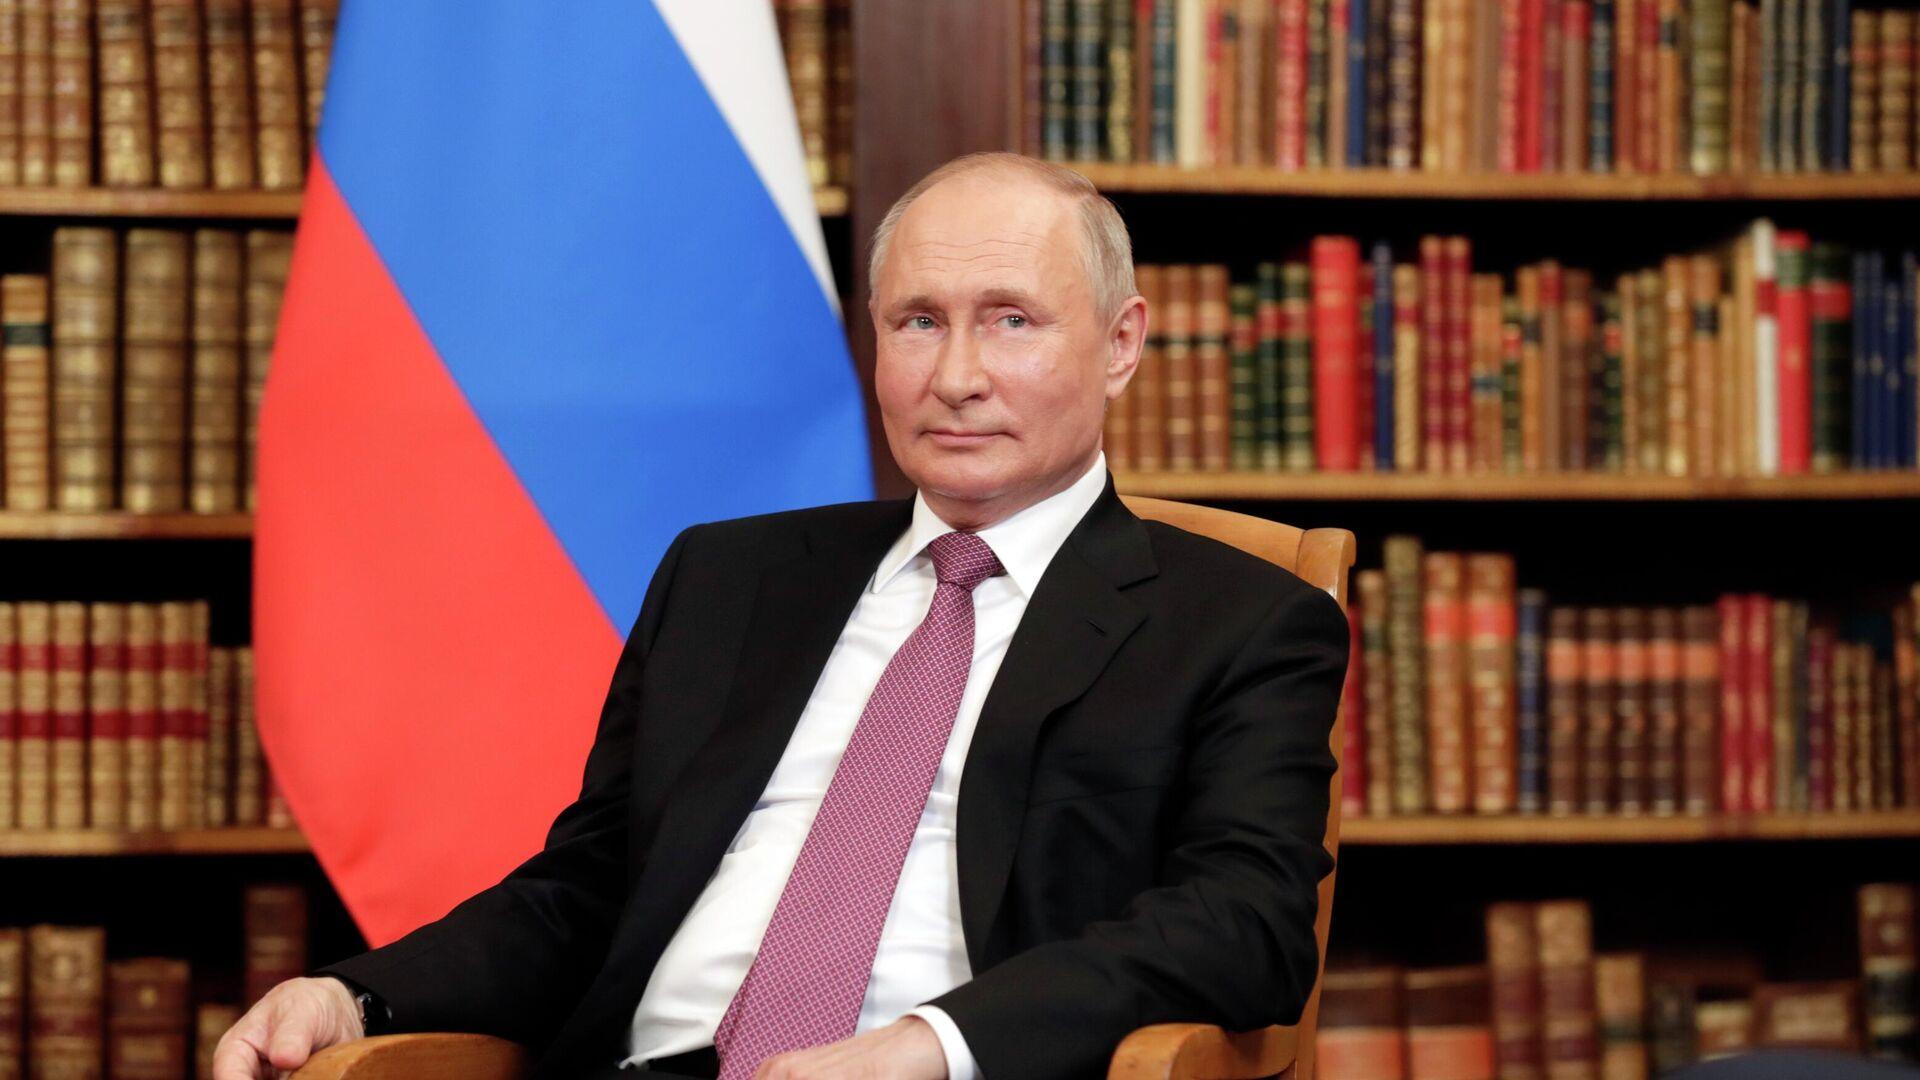 Президент РФ Владимир Путин во время встречи с президентом США Джо Байденом на вилле Ла Гранж - РИА Новости, 1920, 16.06.2021